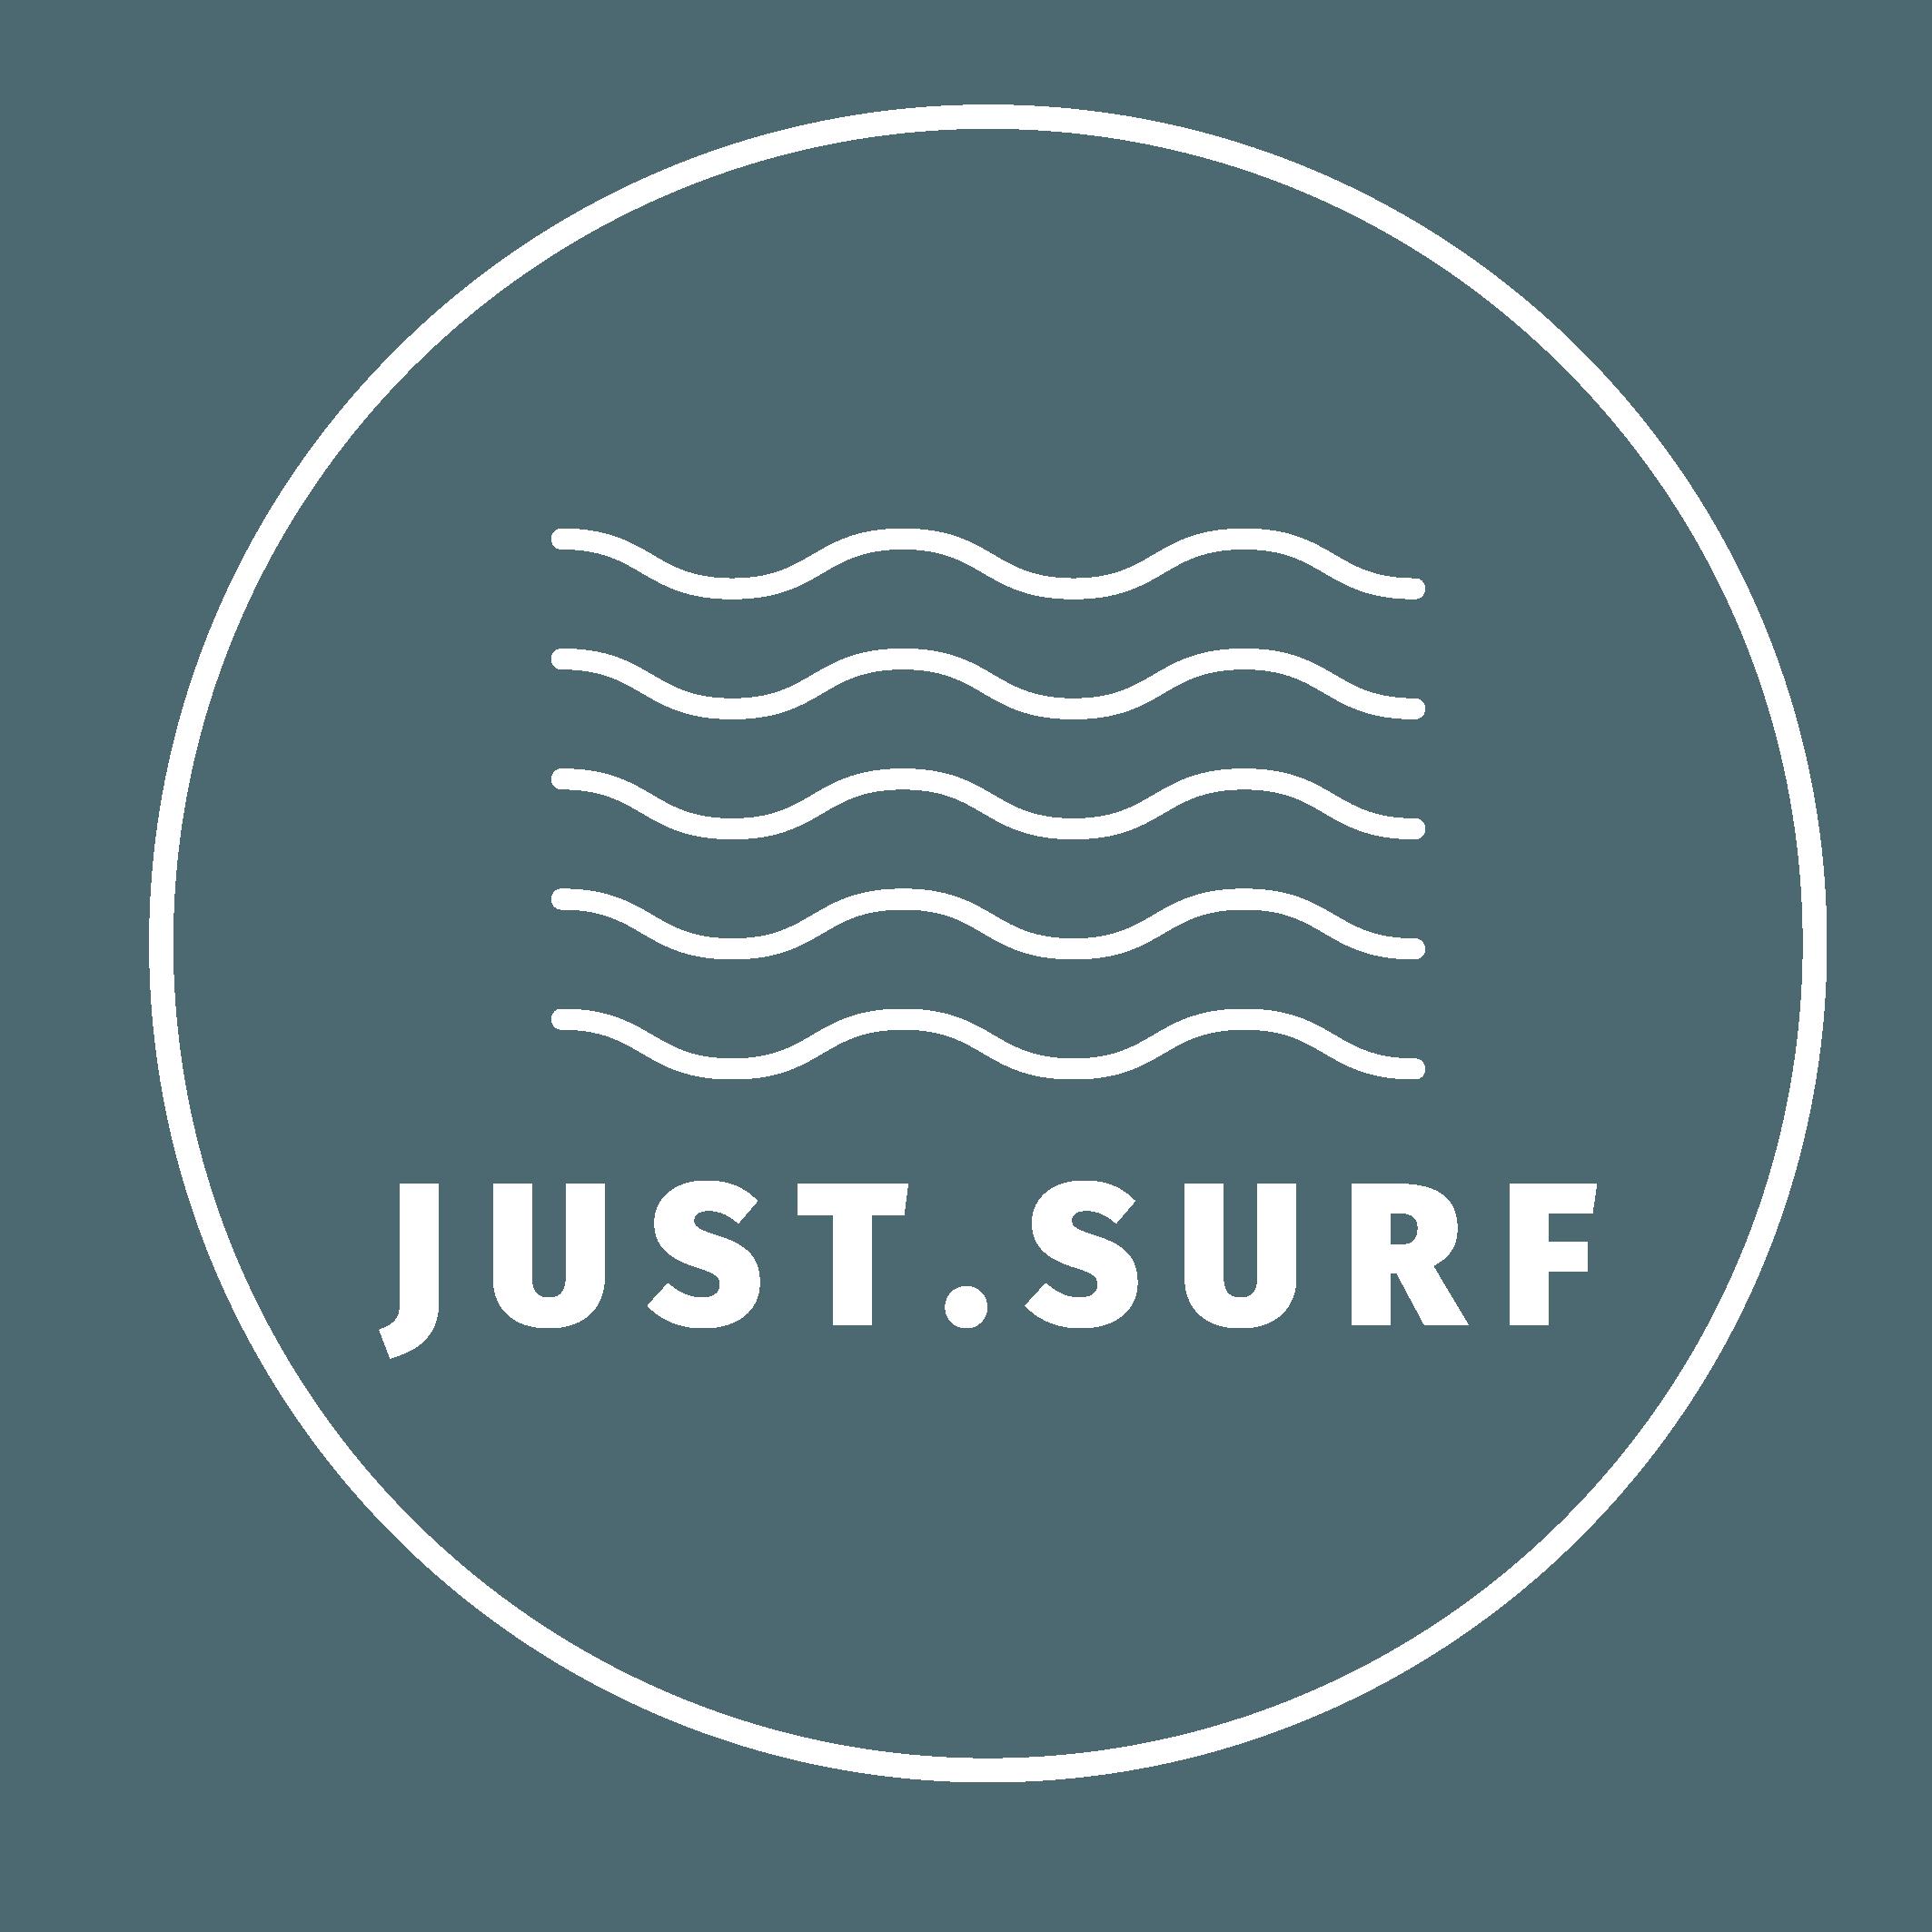 JUST SURF LOGO